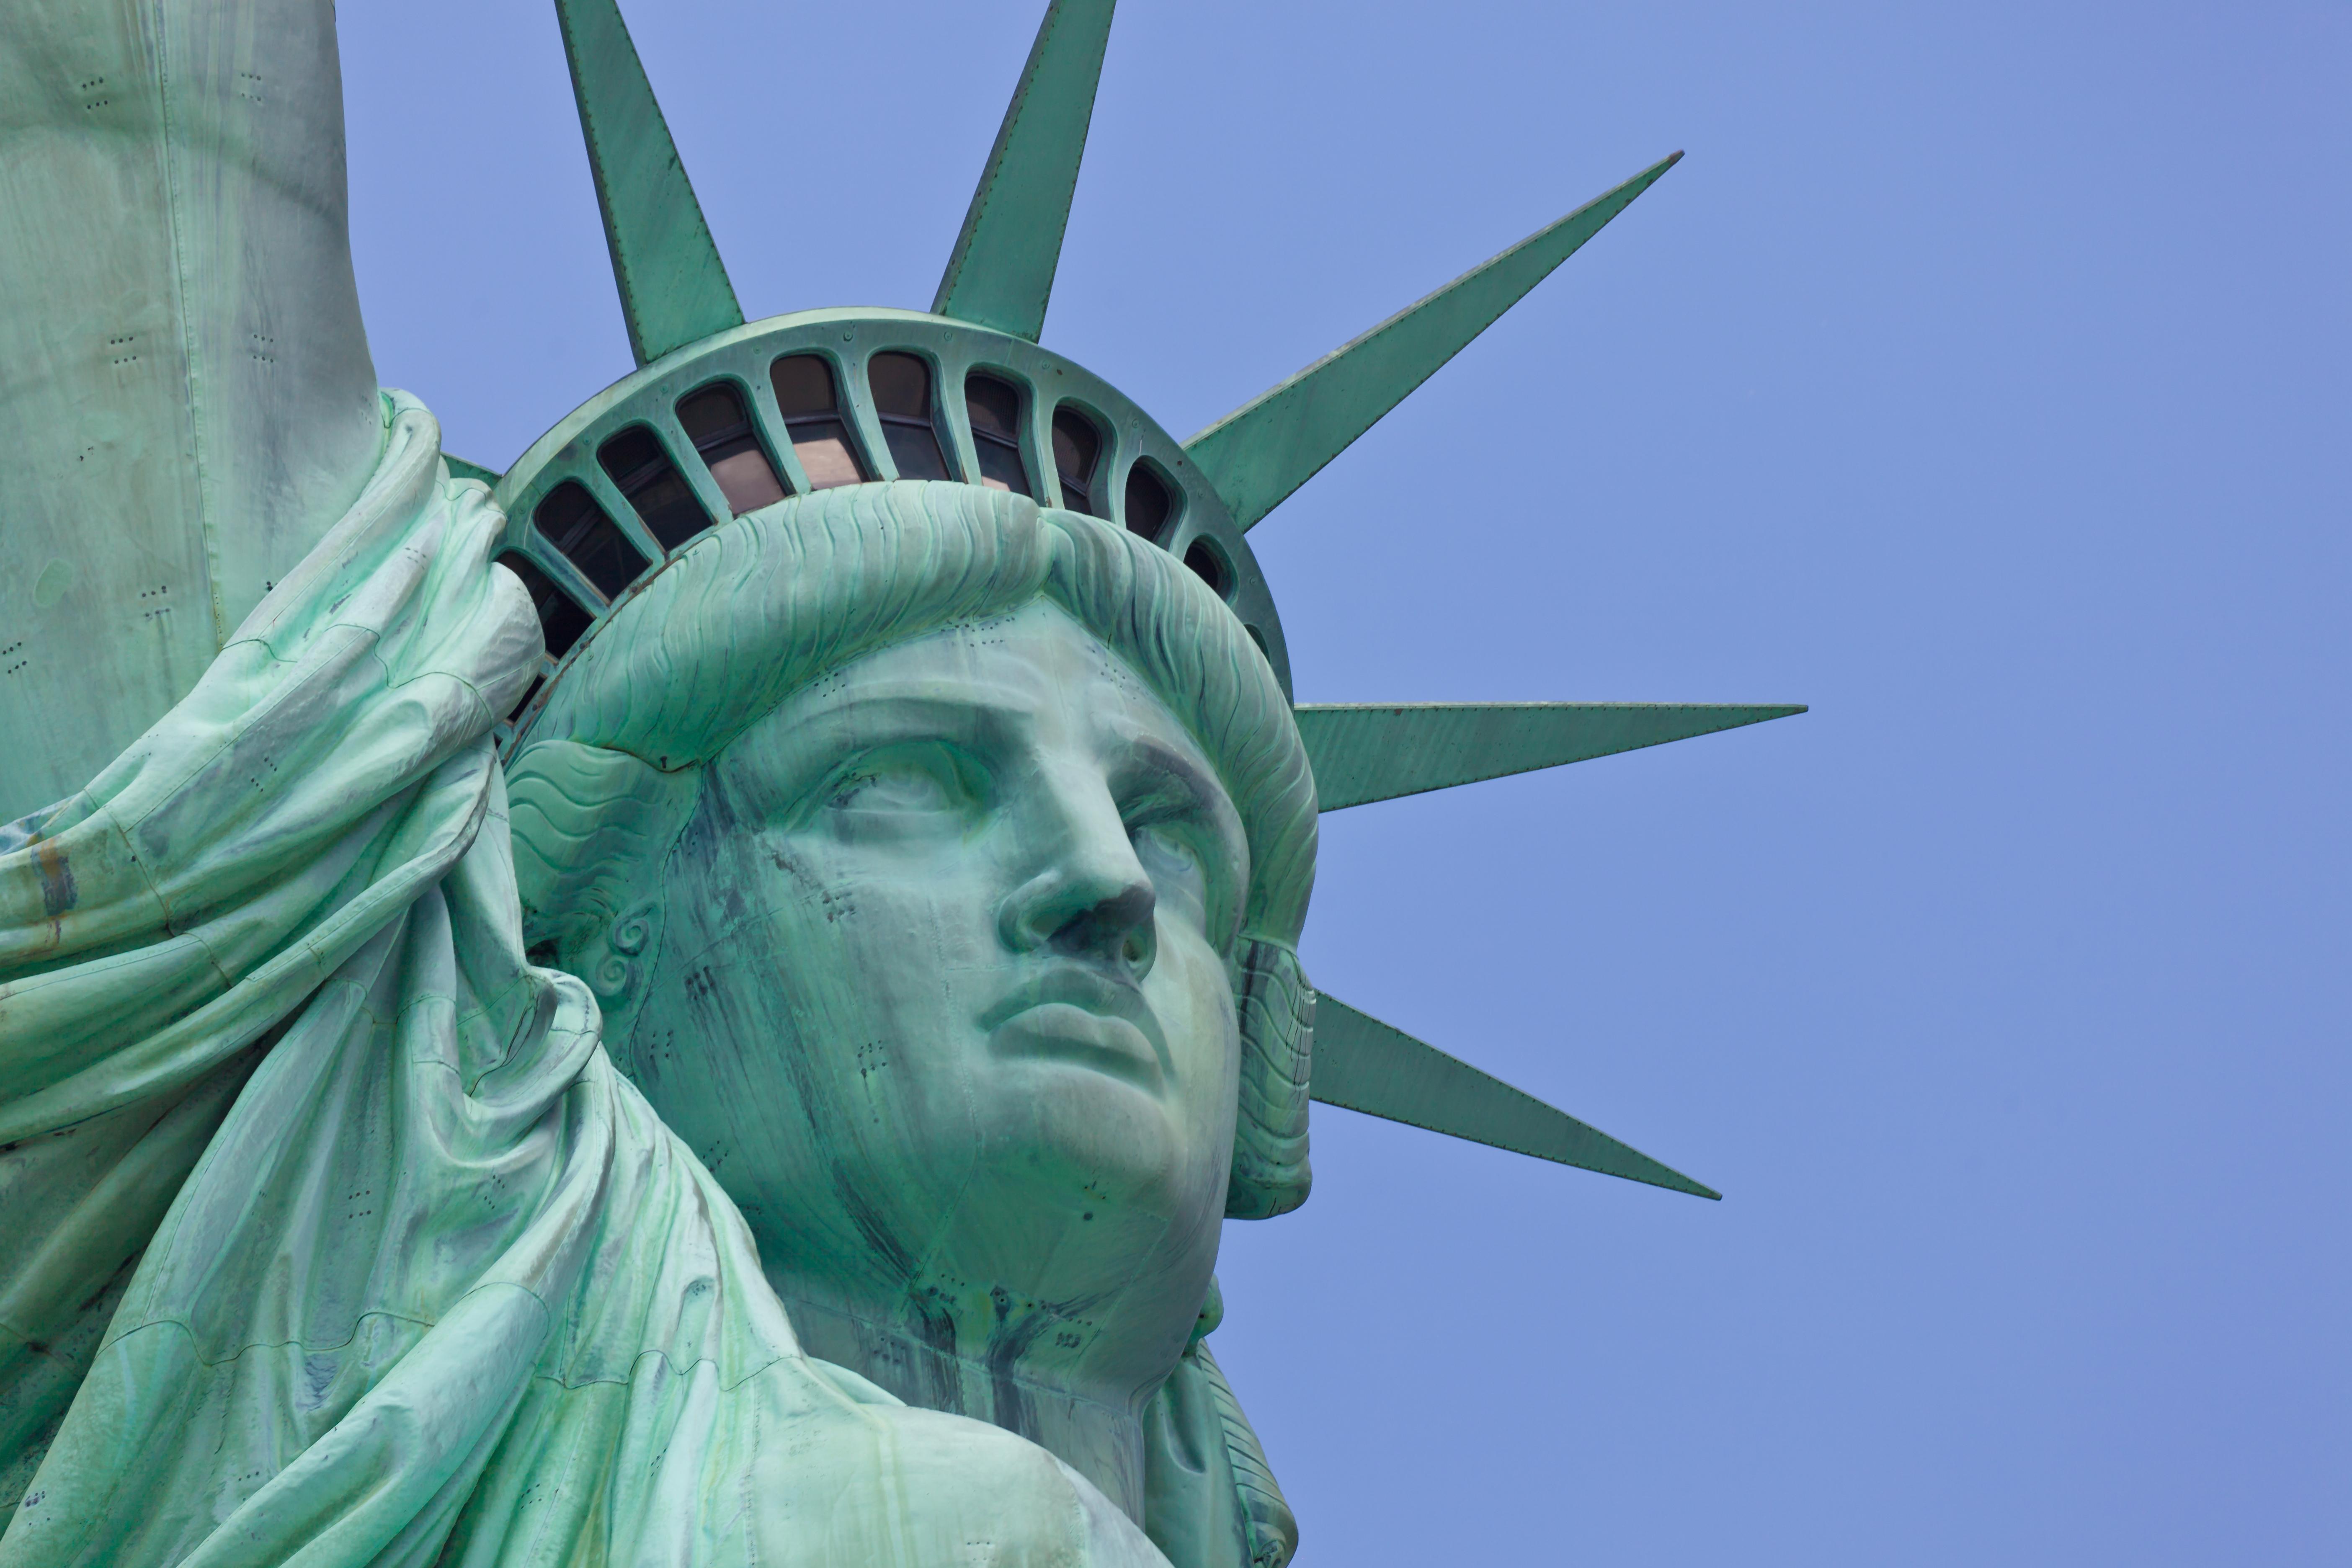 Statue of Liberty Wallpaper or Wall Mural